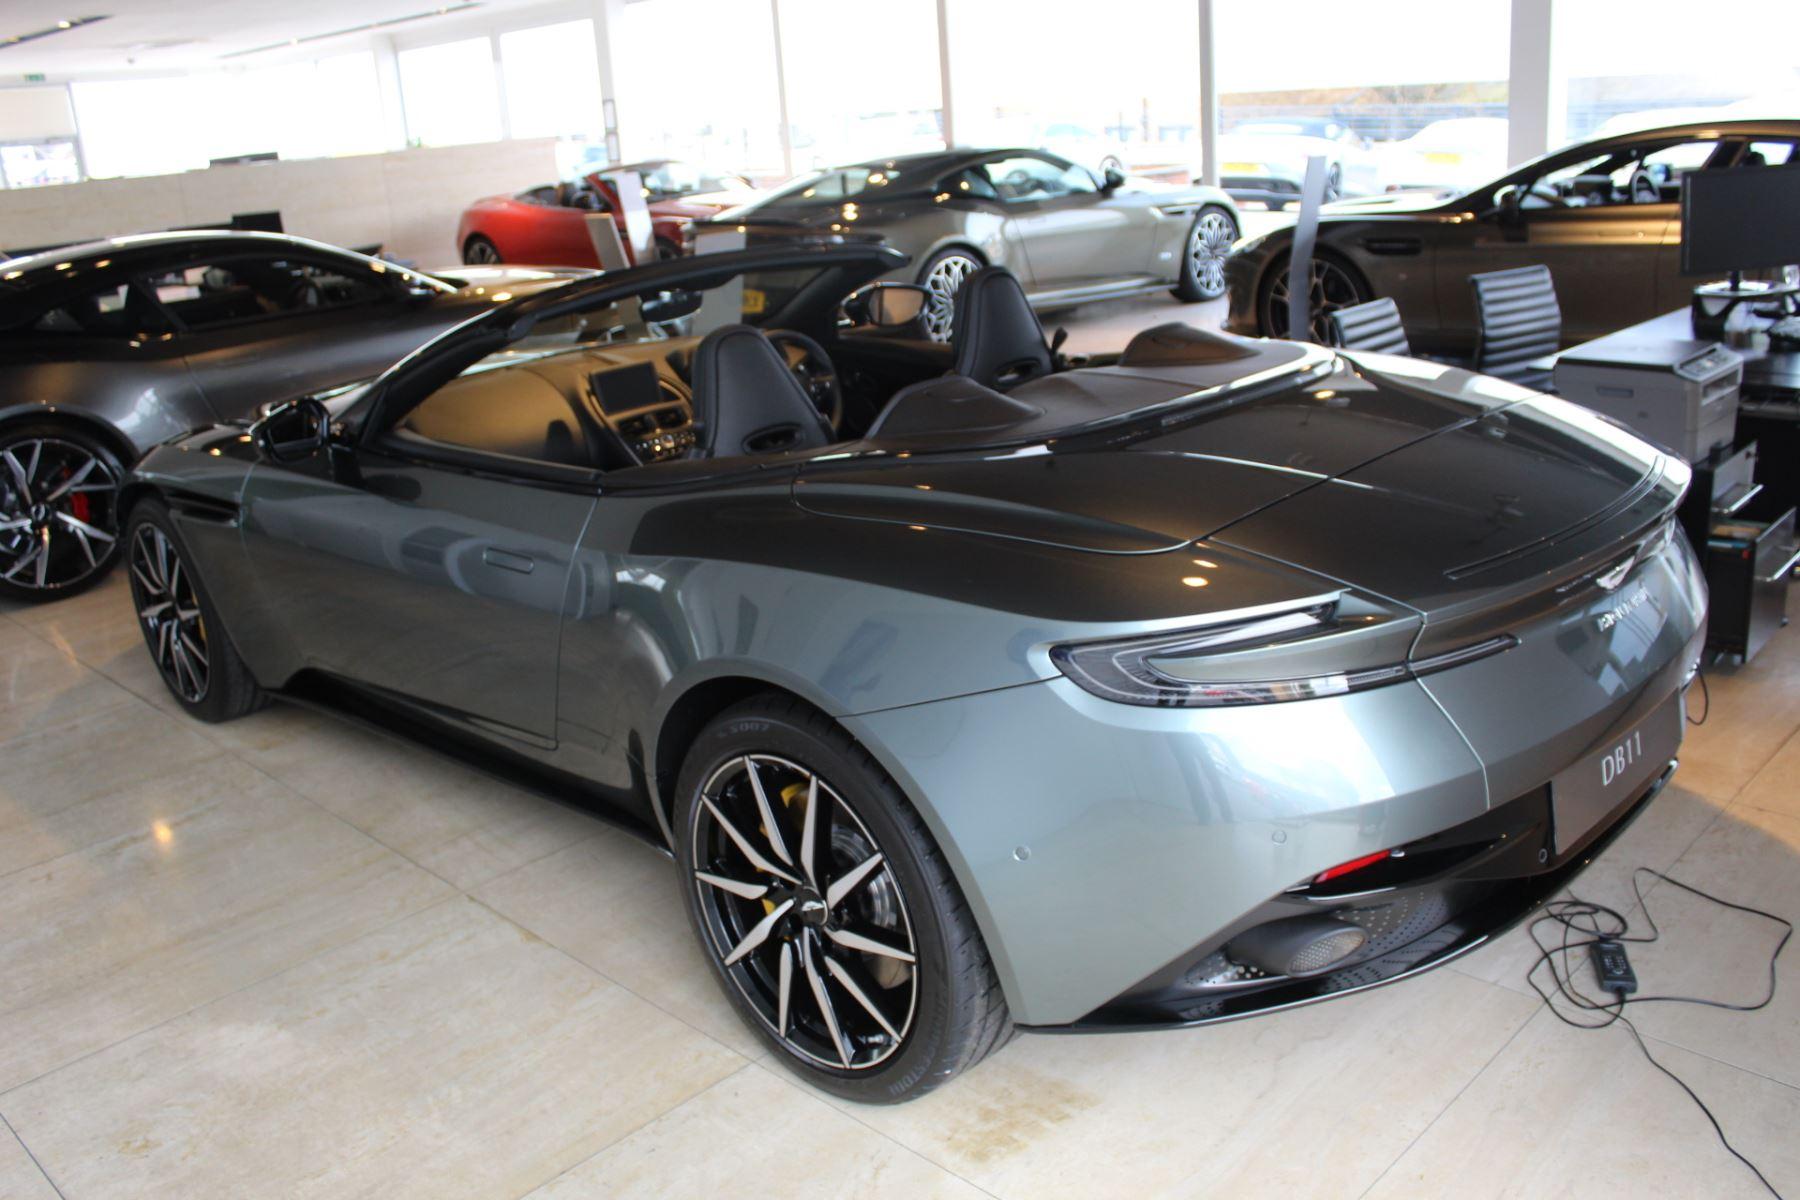 Aston Martin DB11 V8 Volante Touchtronic image 4